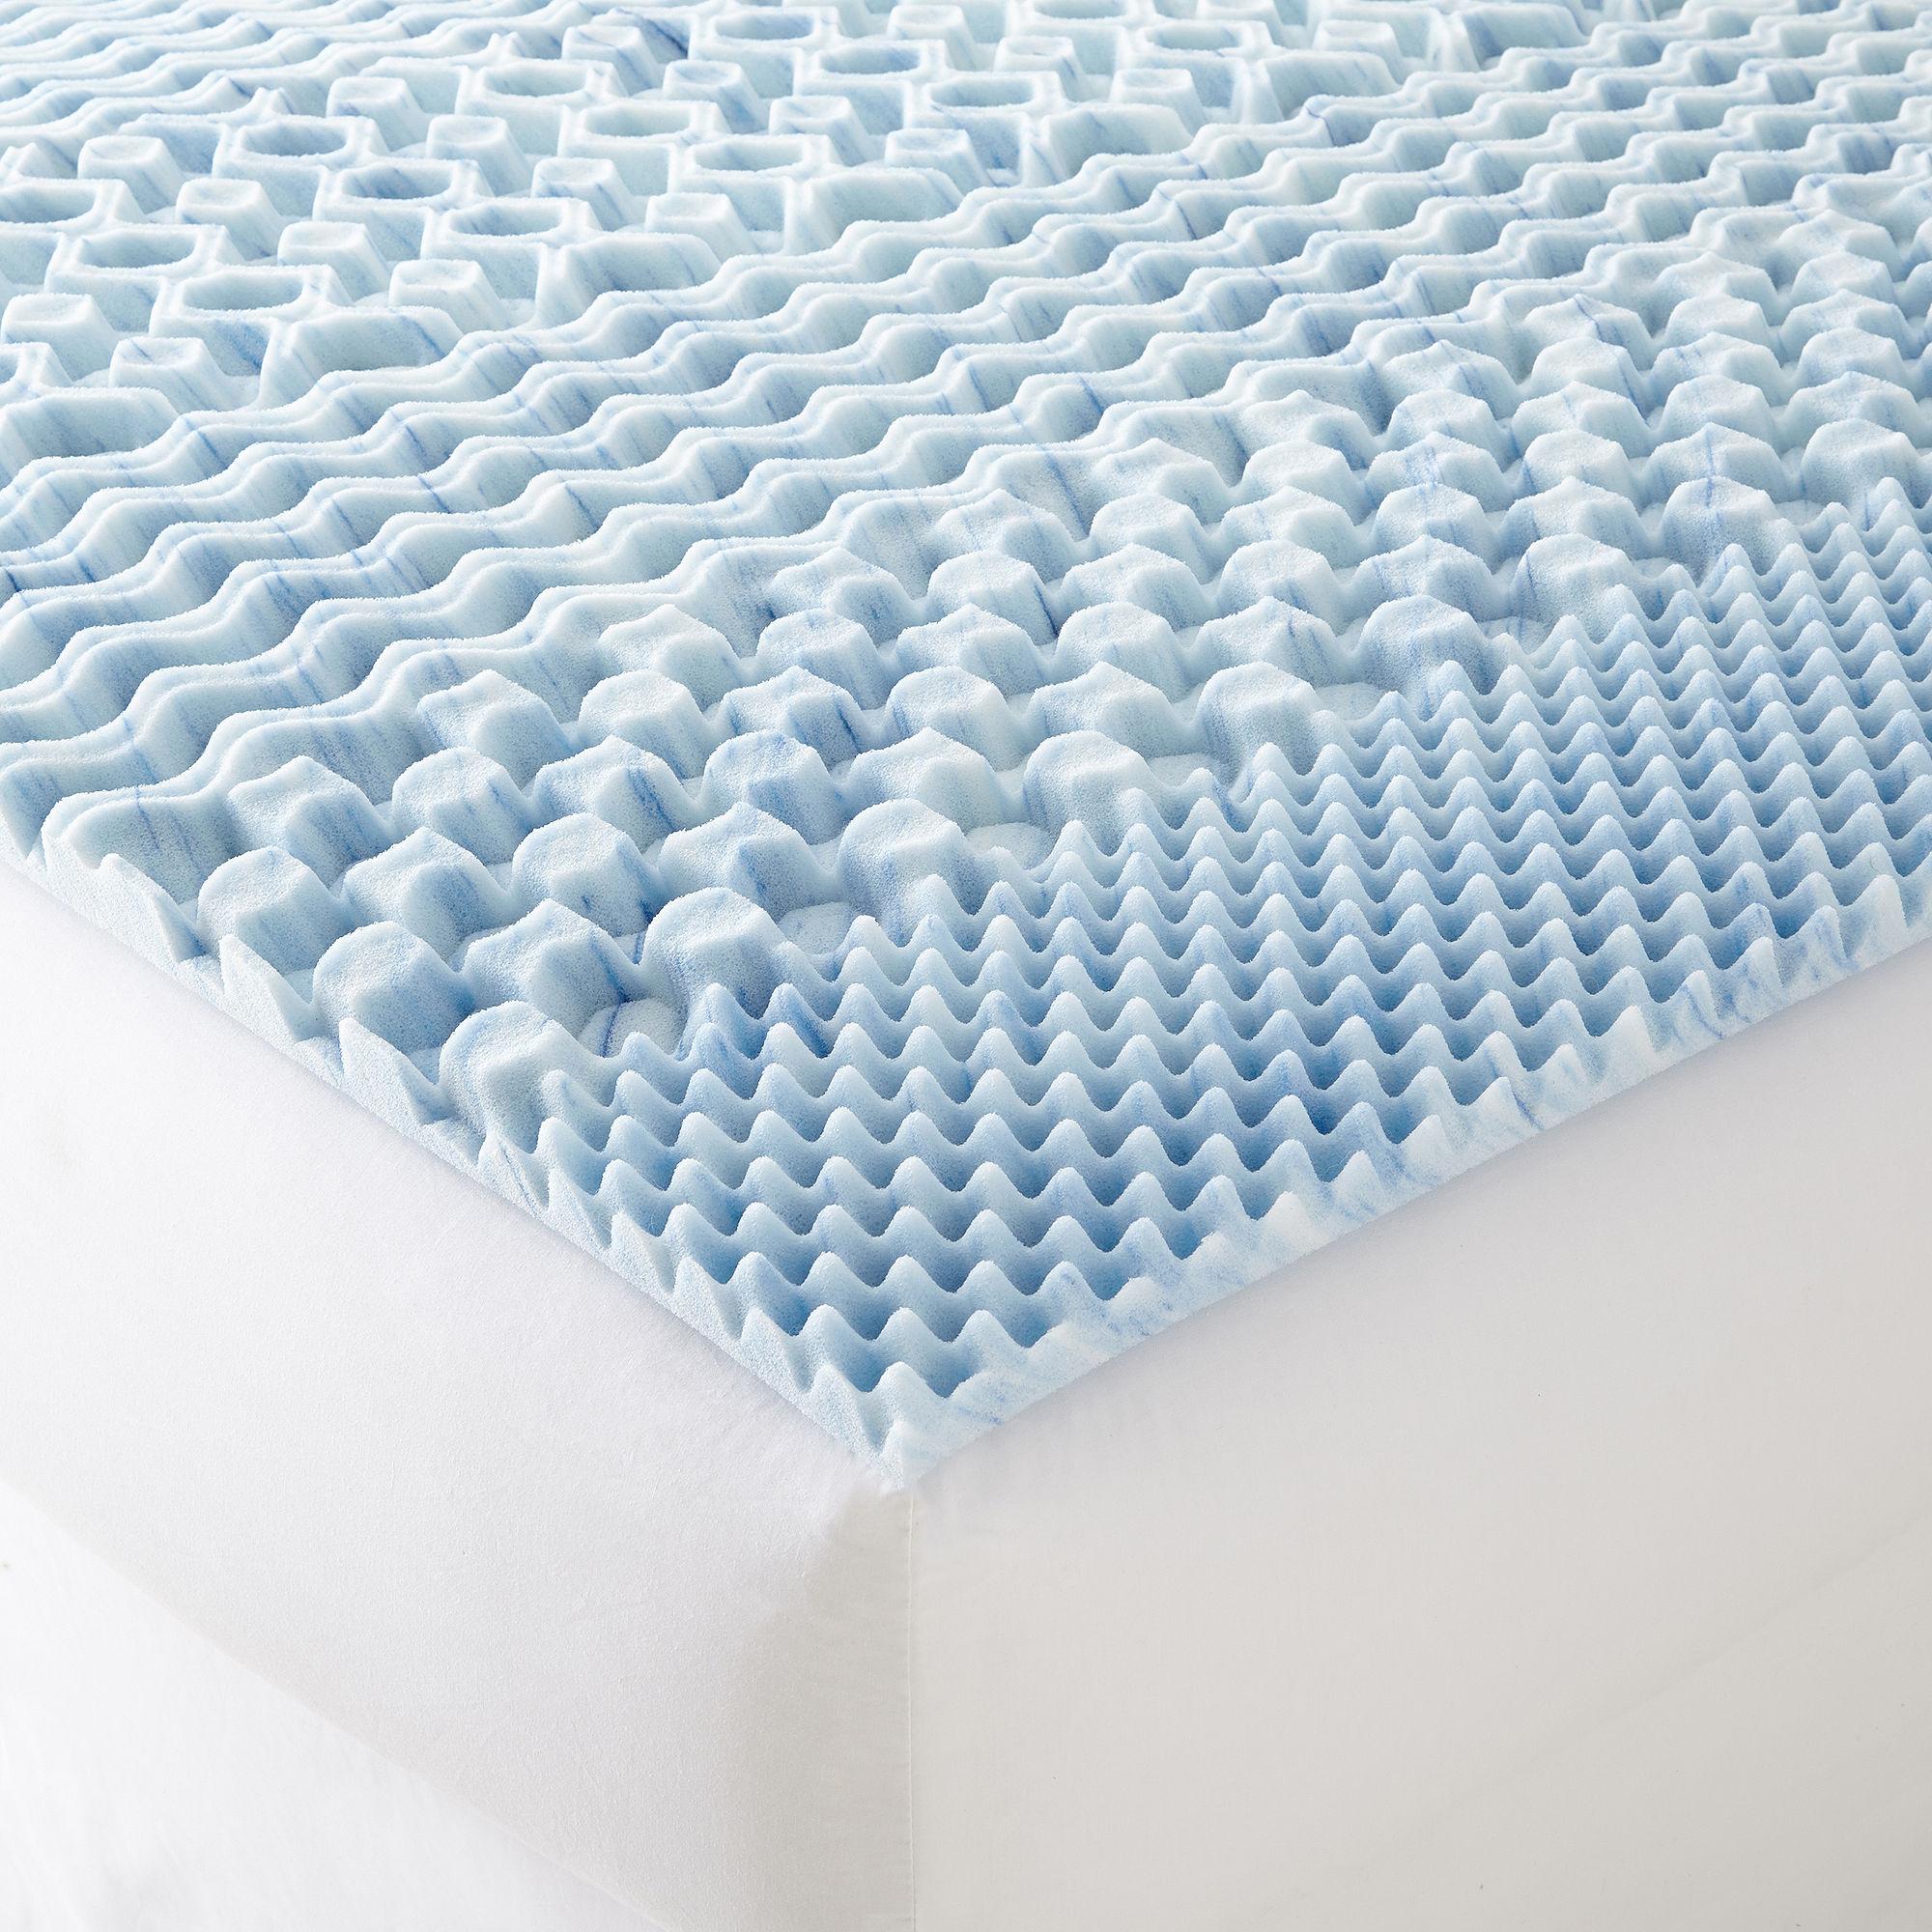 Upc 031374532255 Iso Cool Avela Memory Foam Mattress